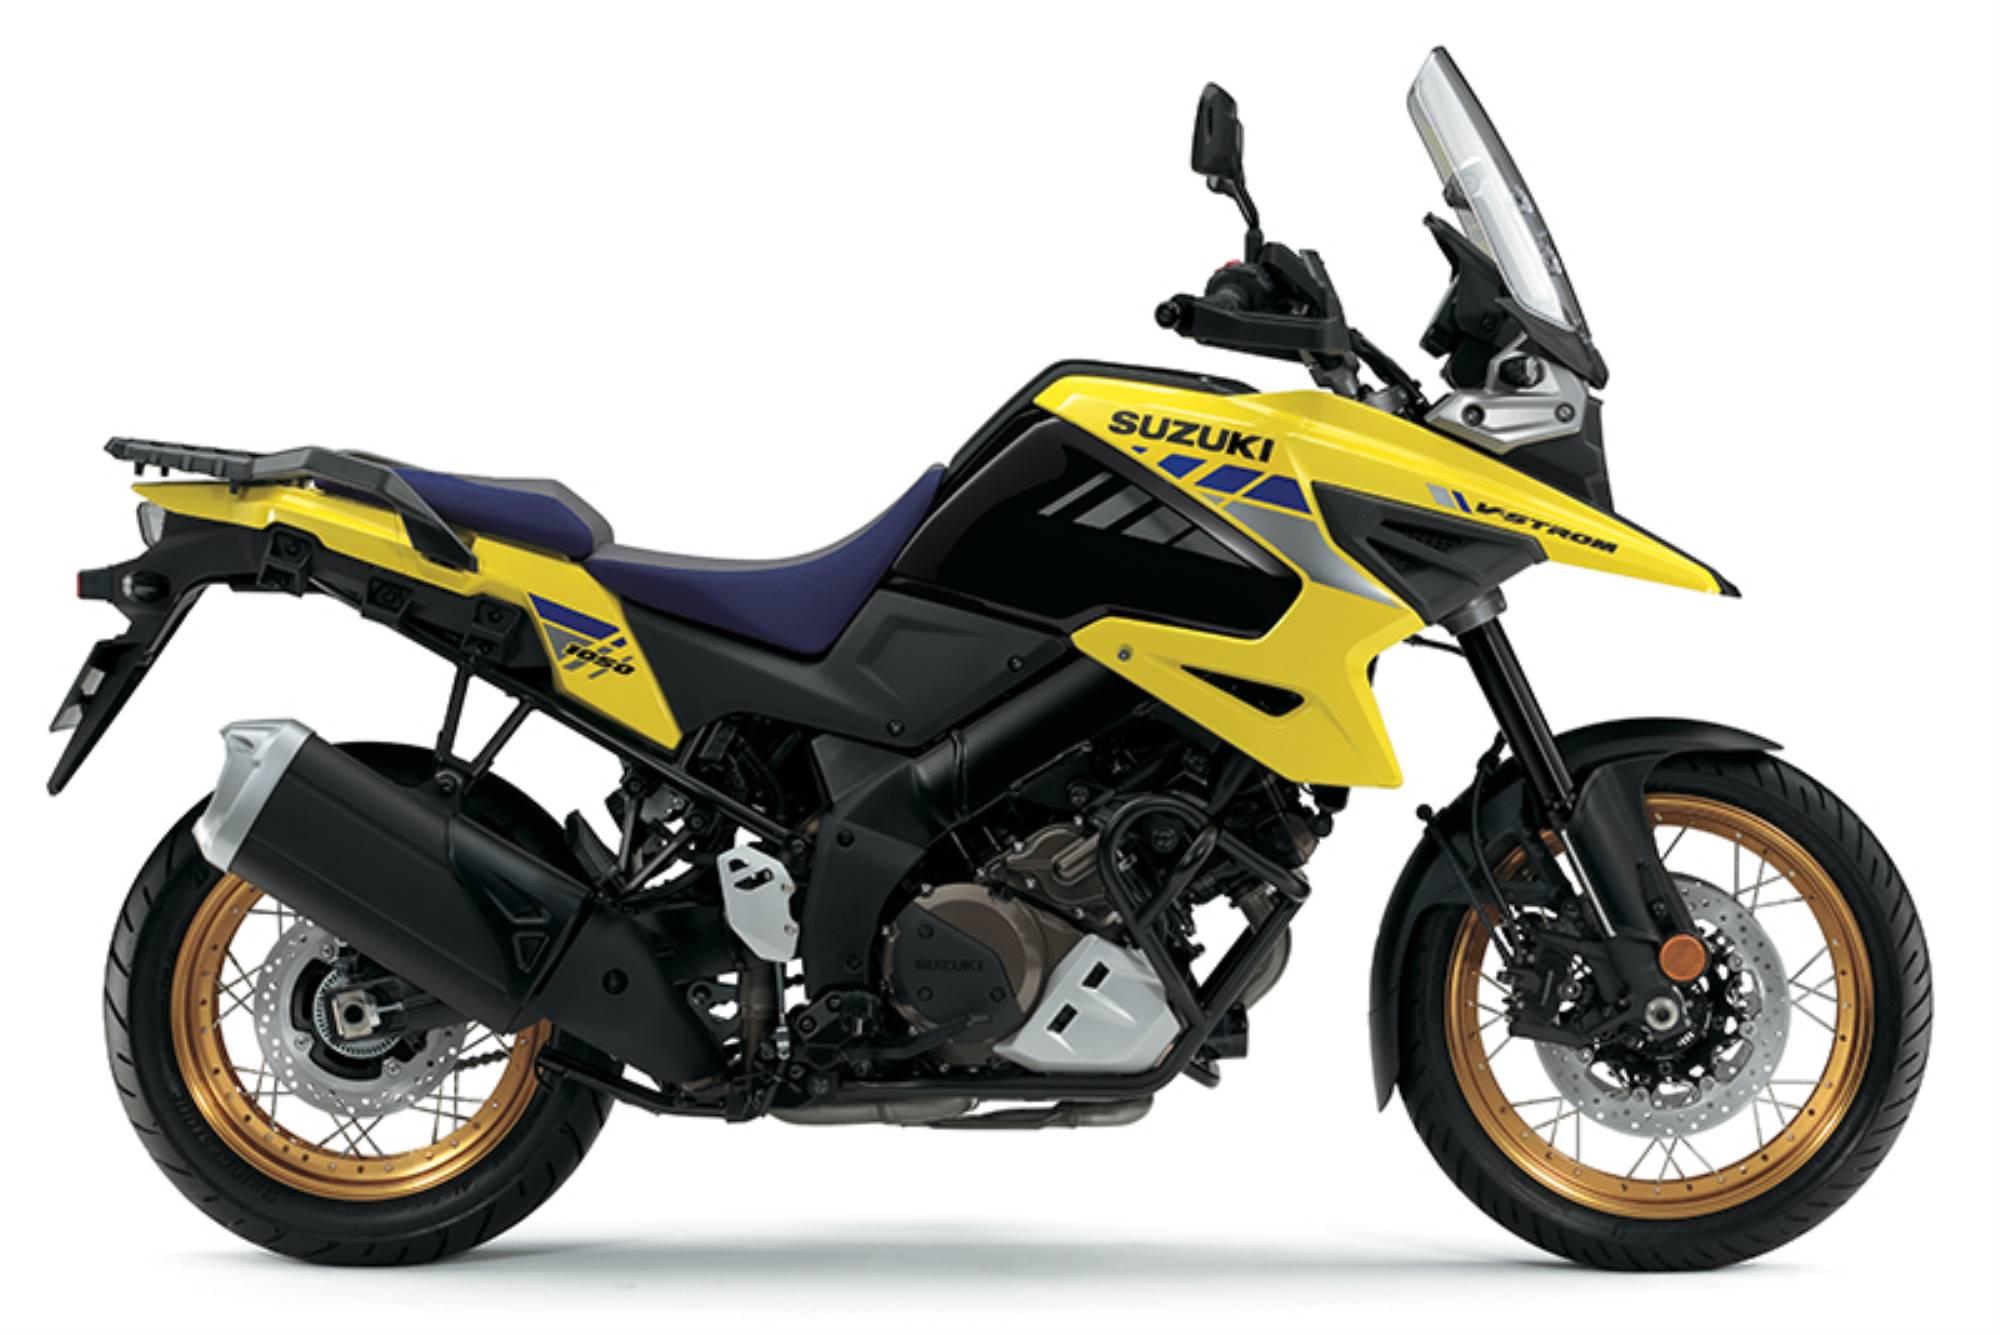 Suzuki V-STROM 1050XT A2